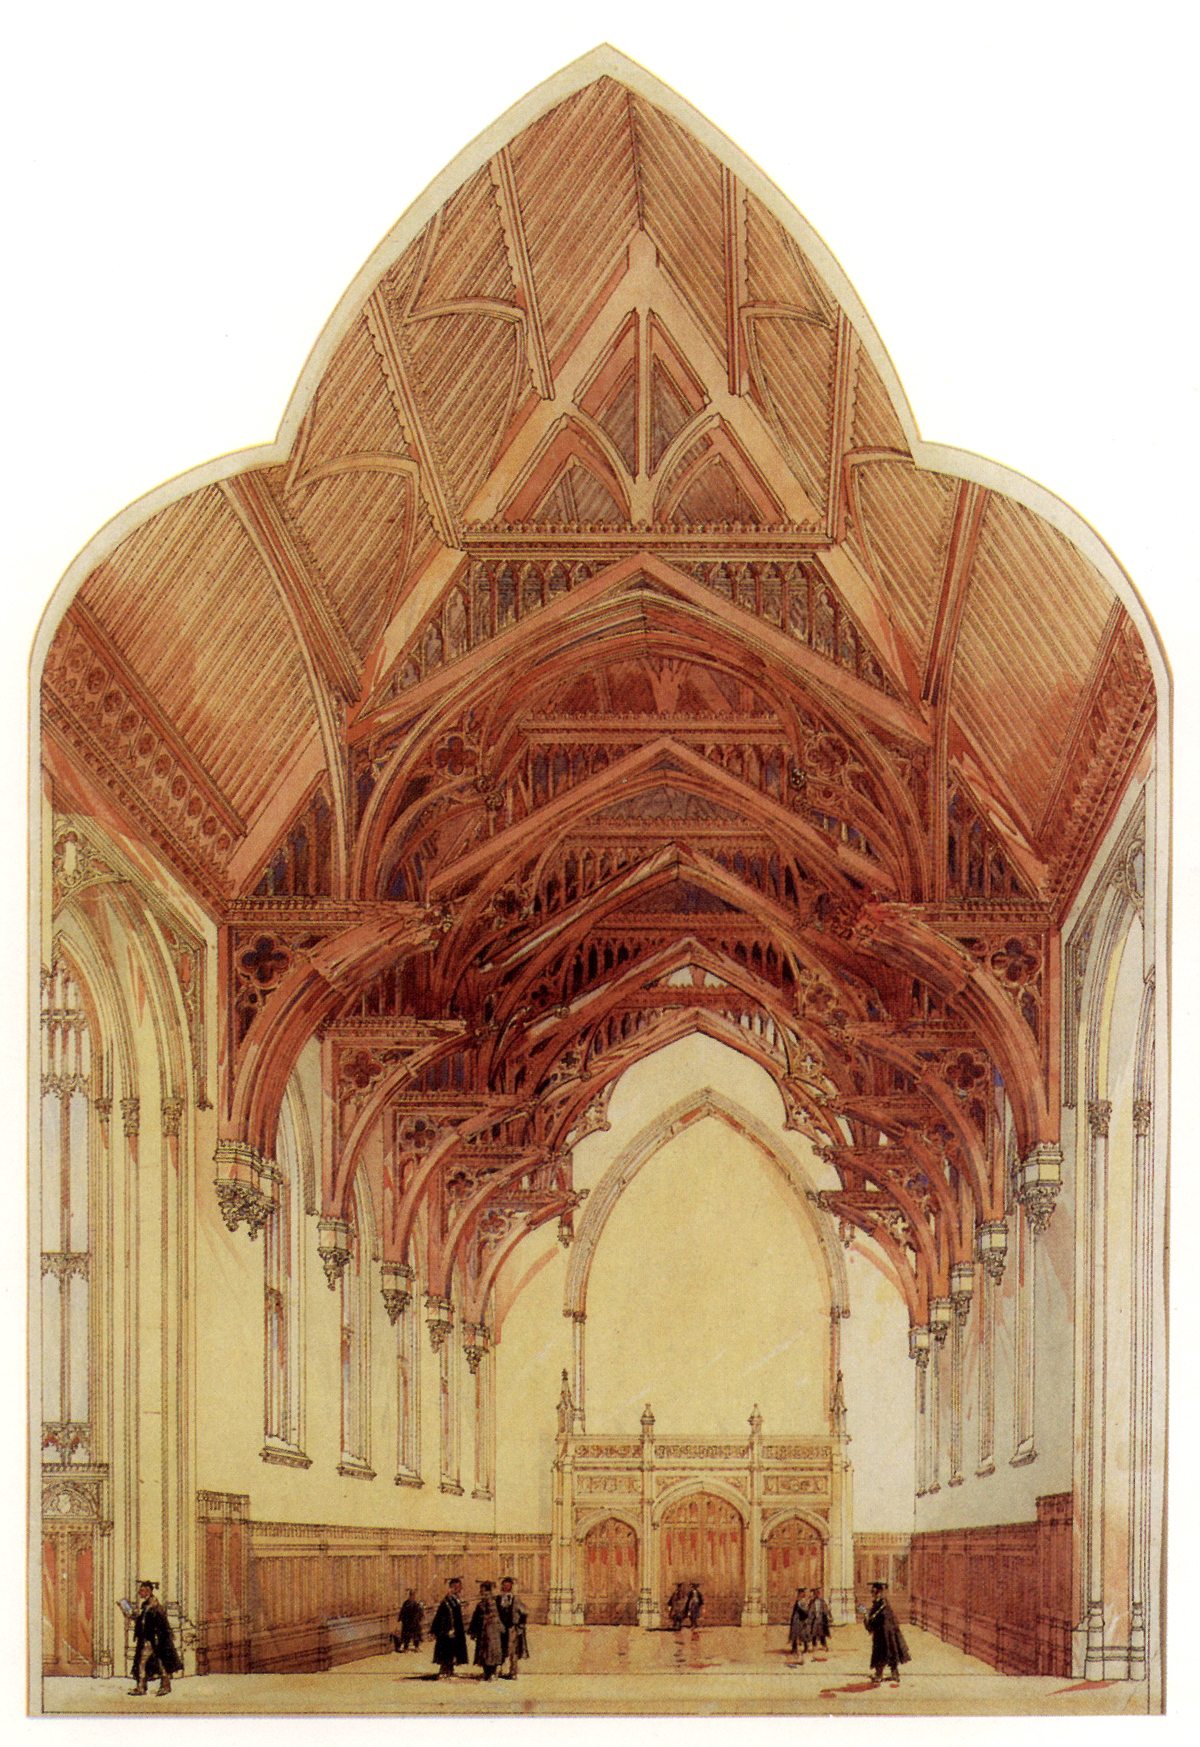 Wilson Hall interior, watercolour perspective